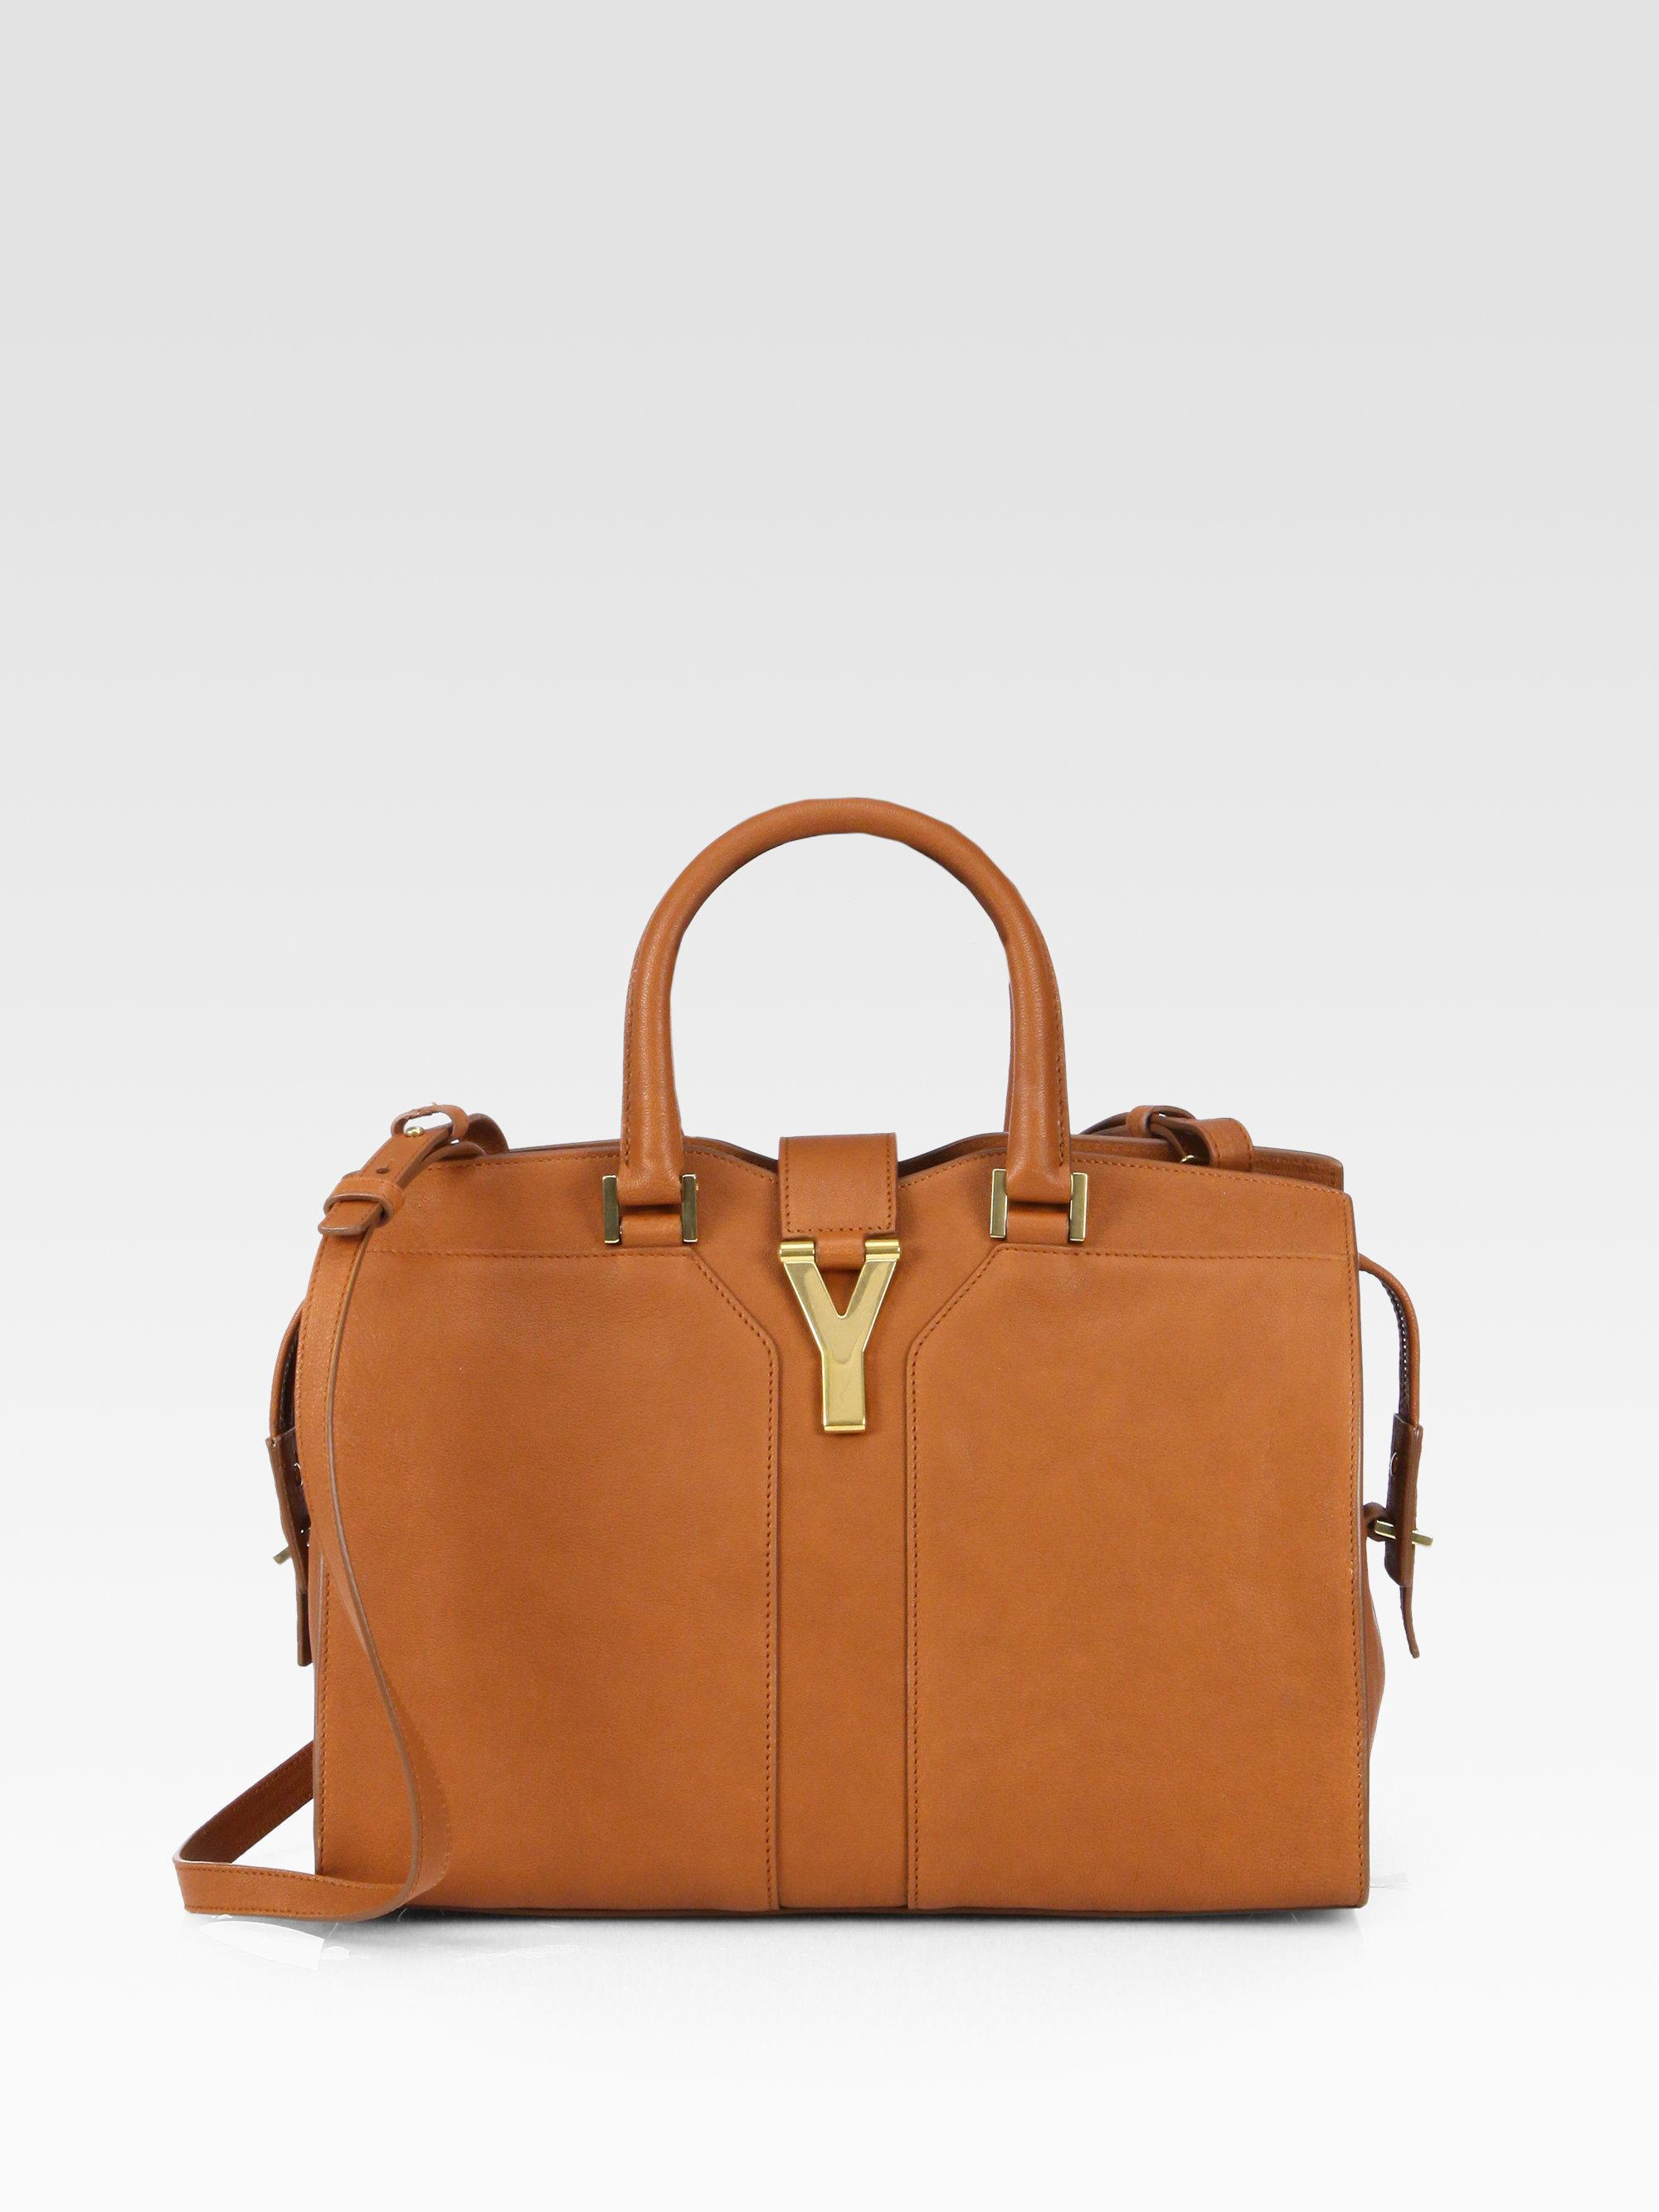 9efedb60618f Lyst - Saint Laurent Ysl Petite Cabas Top Handle Bag in Brown